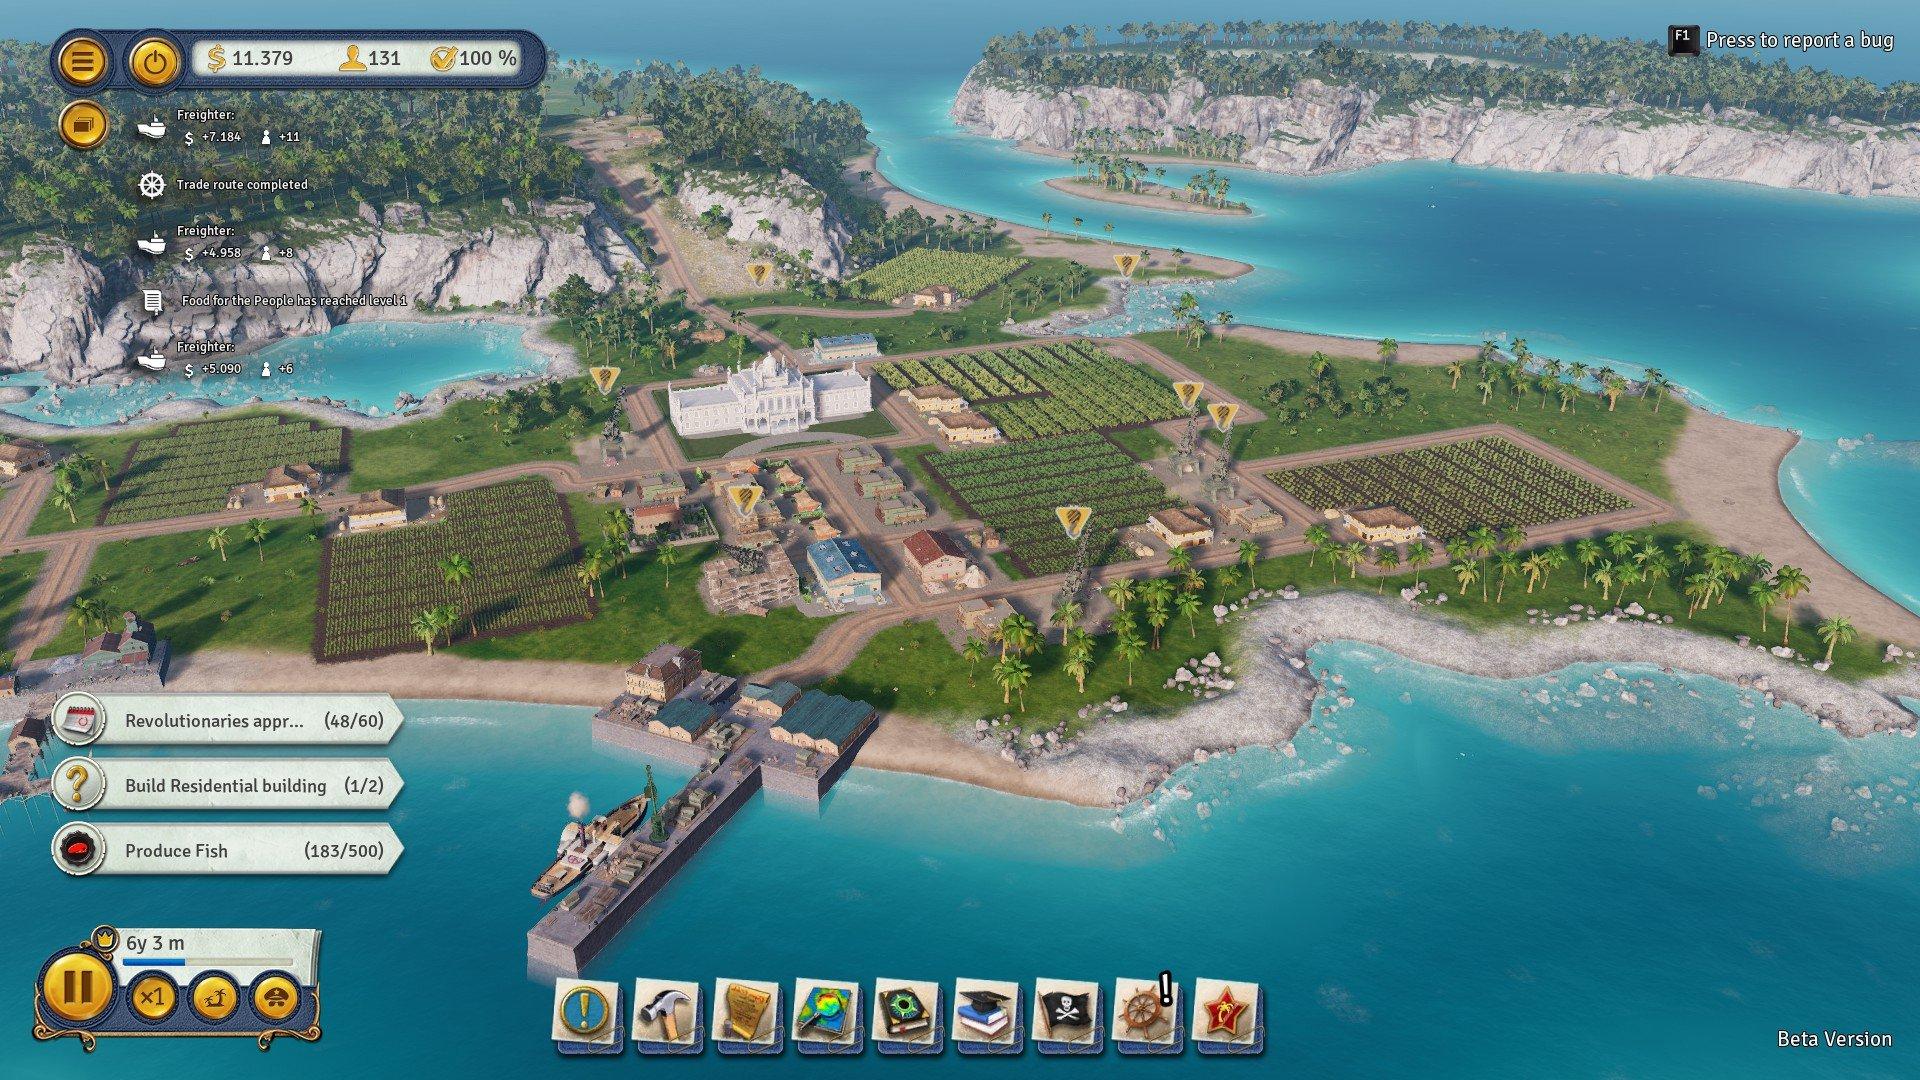 Tropico 6 Beta